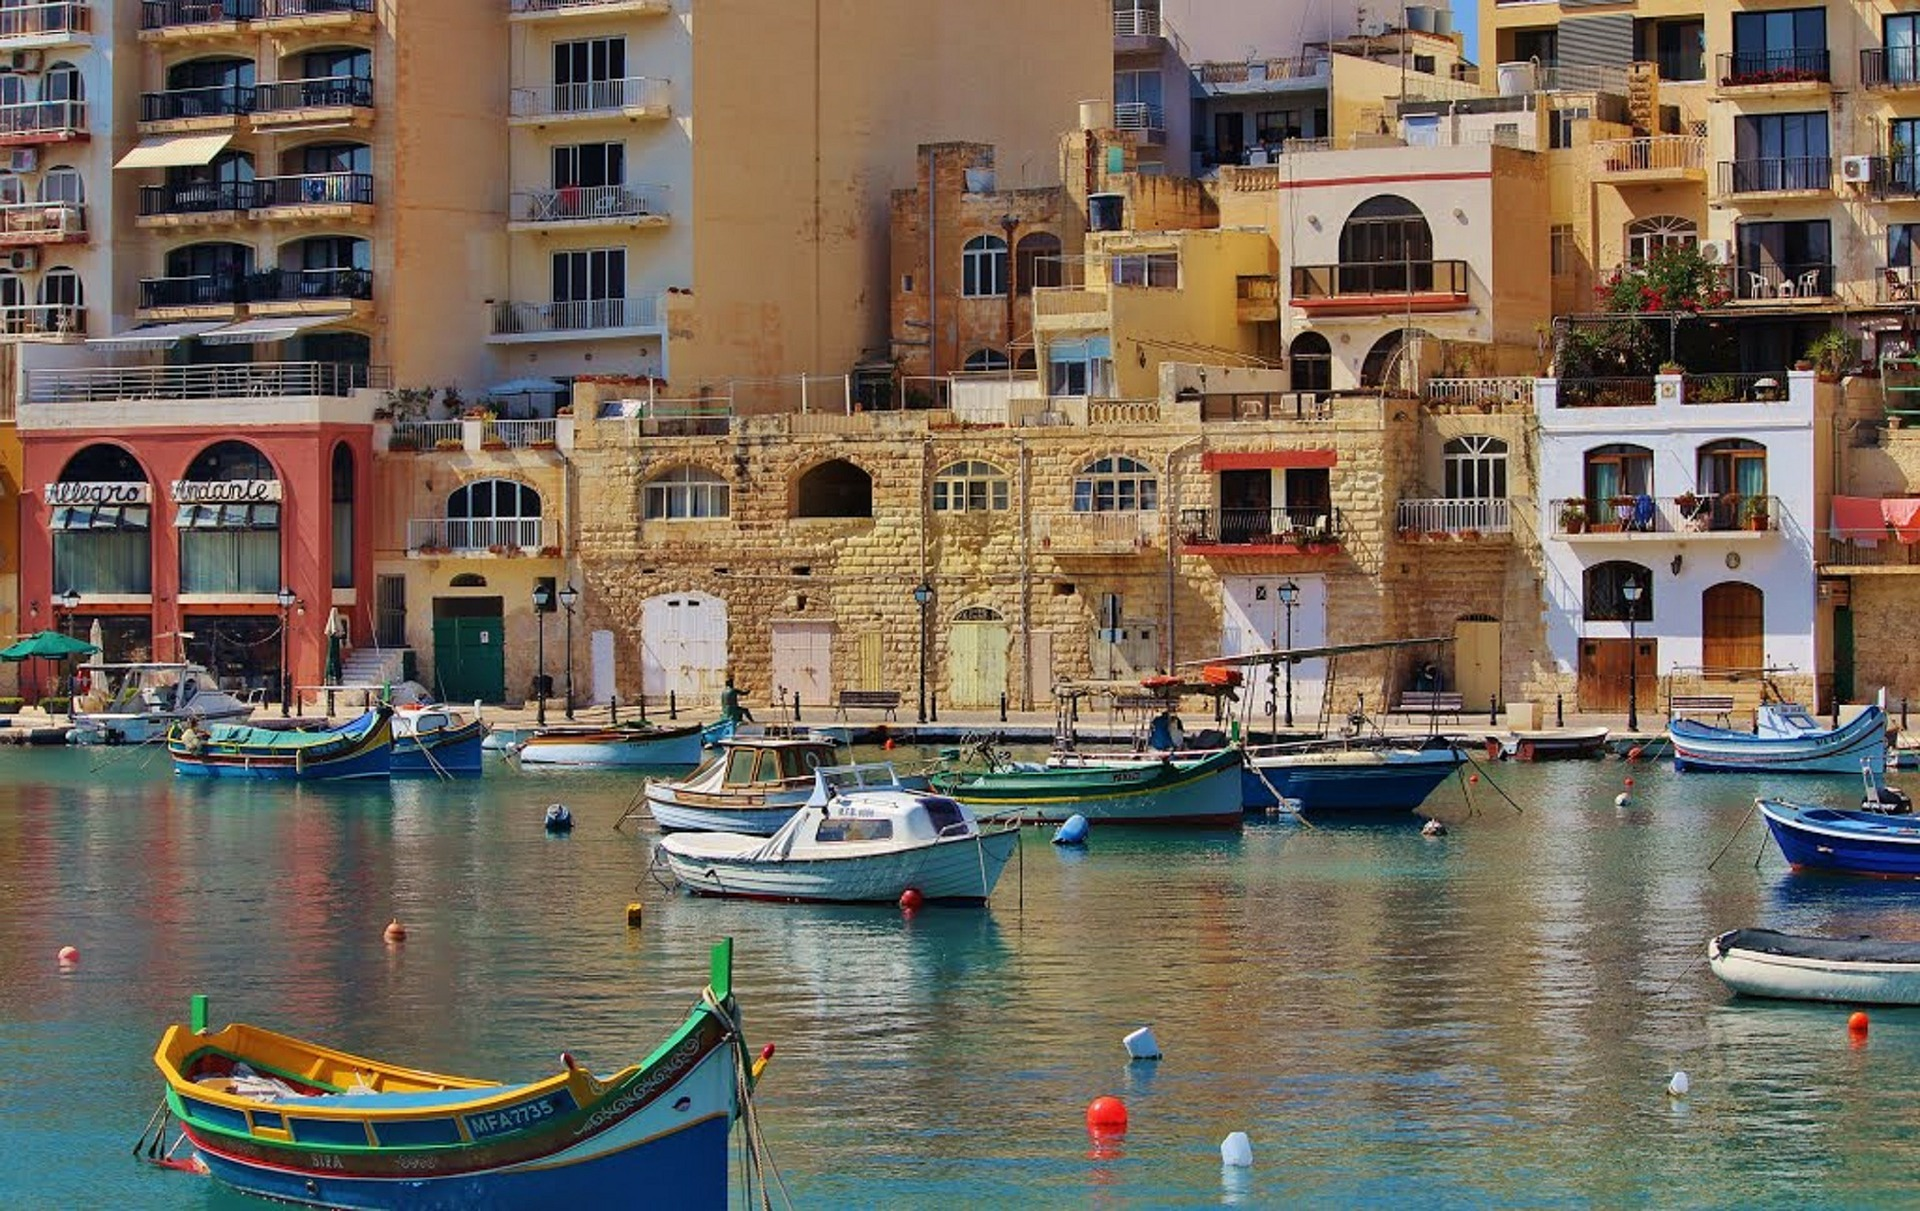 Pier in Malta